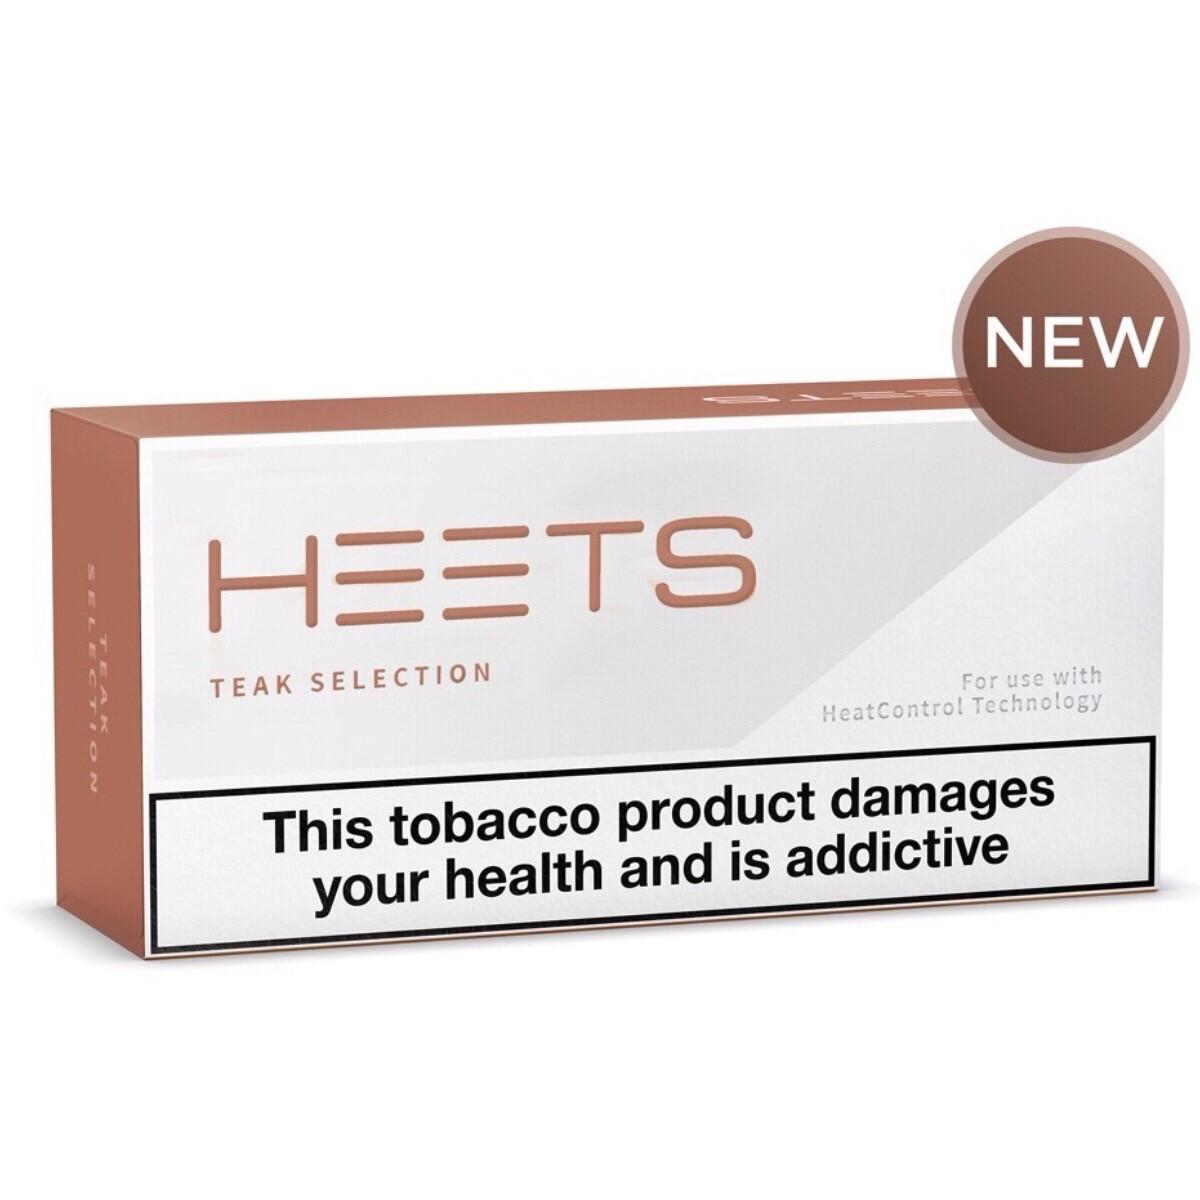 Teak Selection / Label Heets